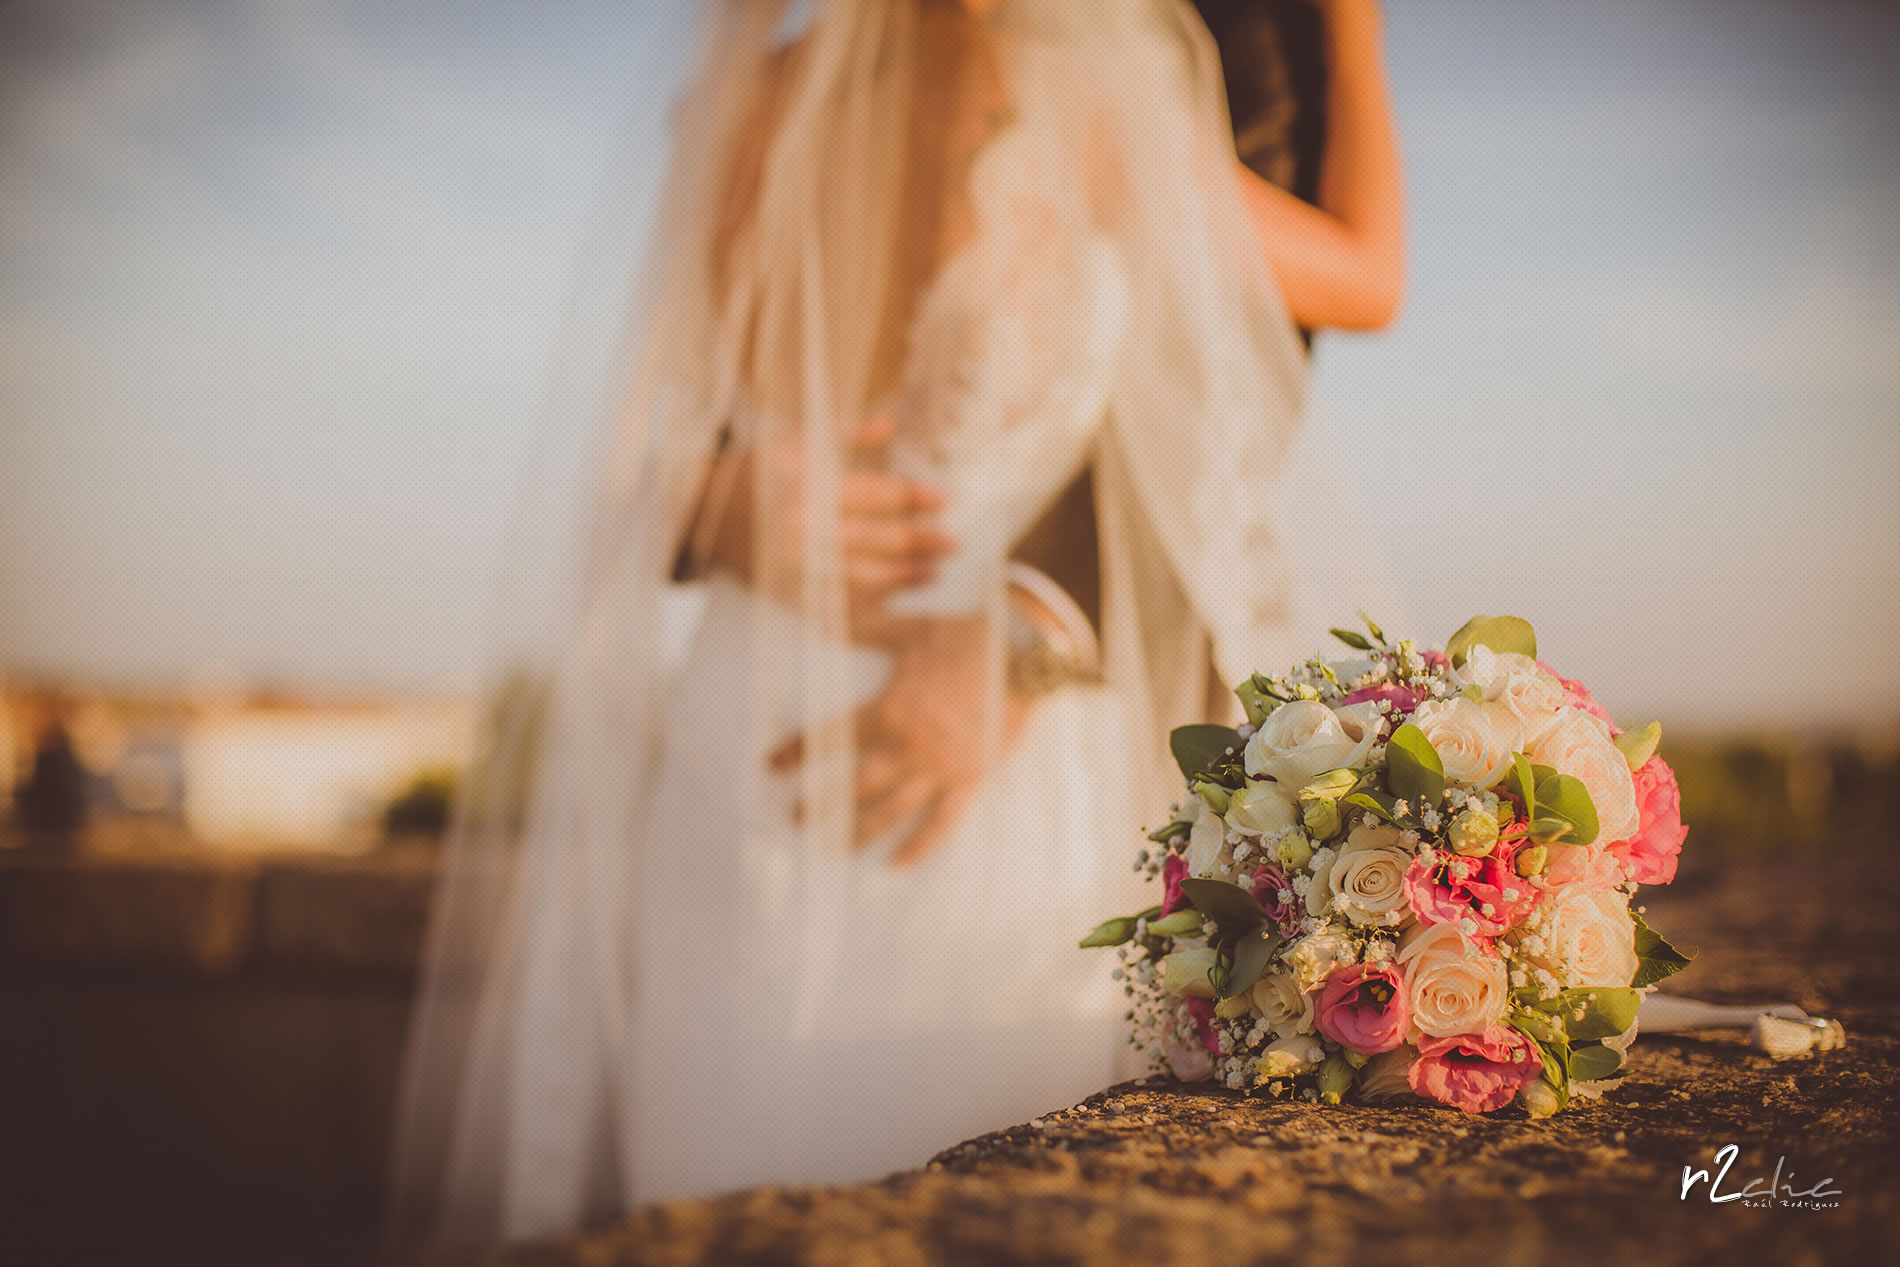 [boda M&S] mys-32-boda-religiosa-valdivia-guareña-santa-maria-medellin-casablanca-villanueva-serena-badajoz-reportaje